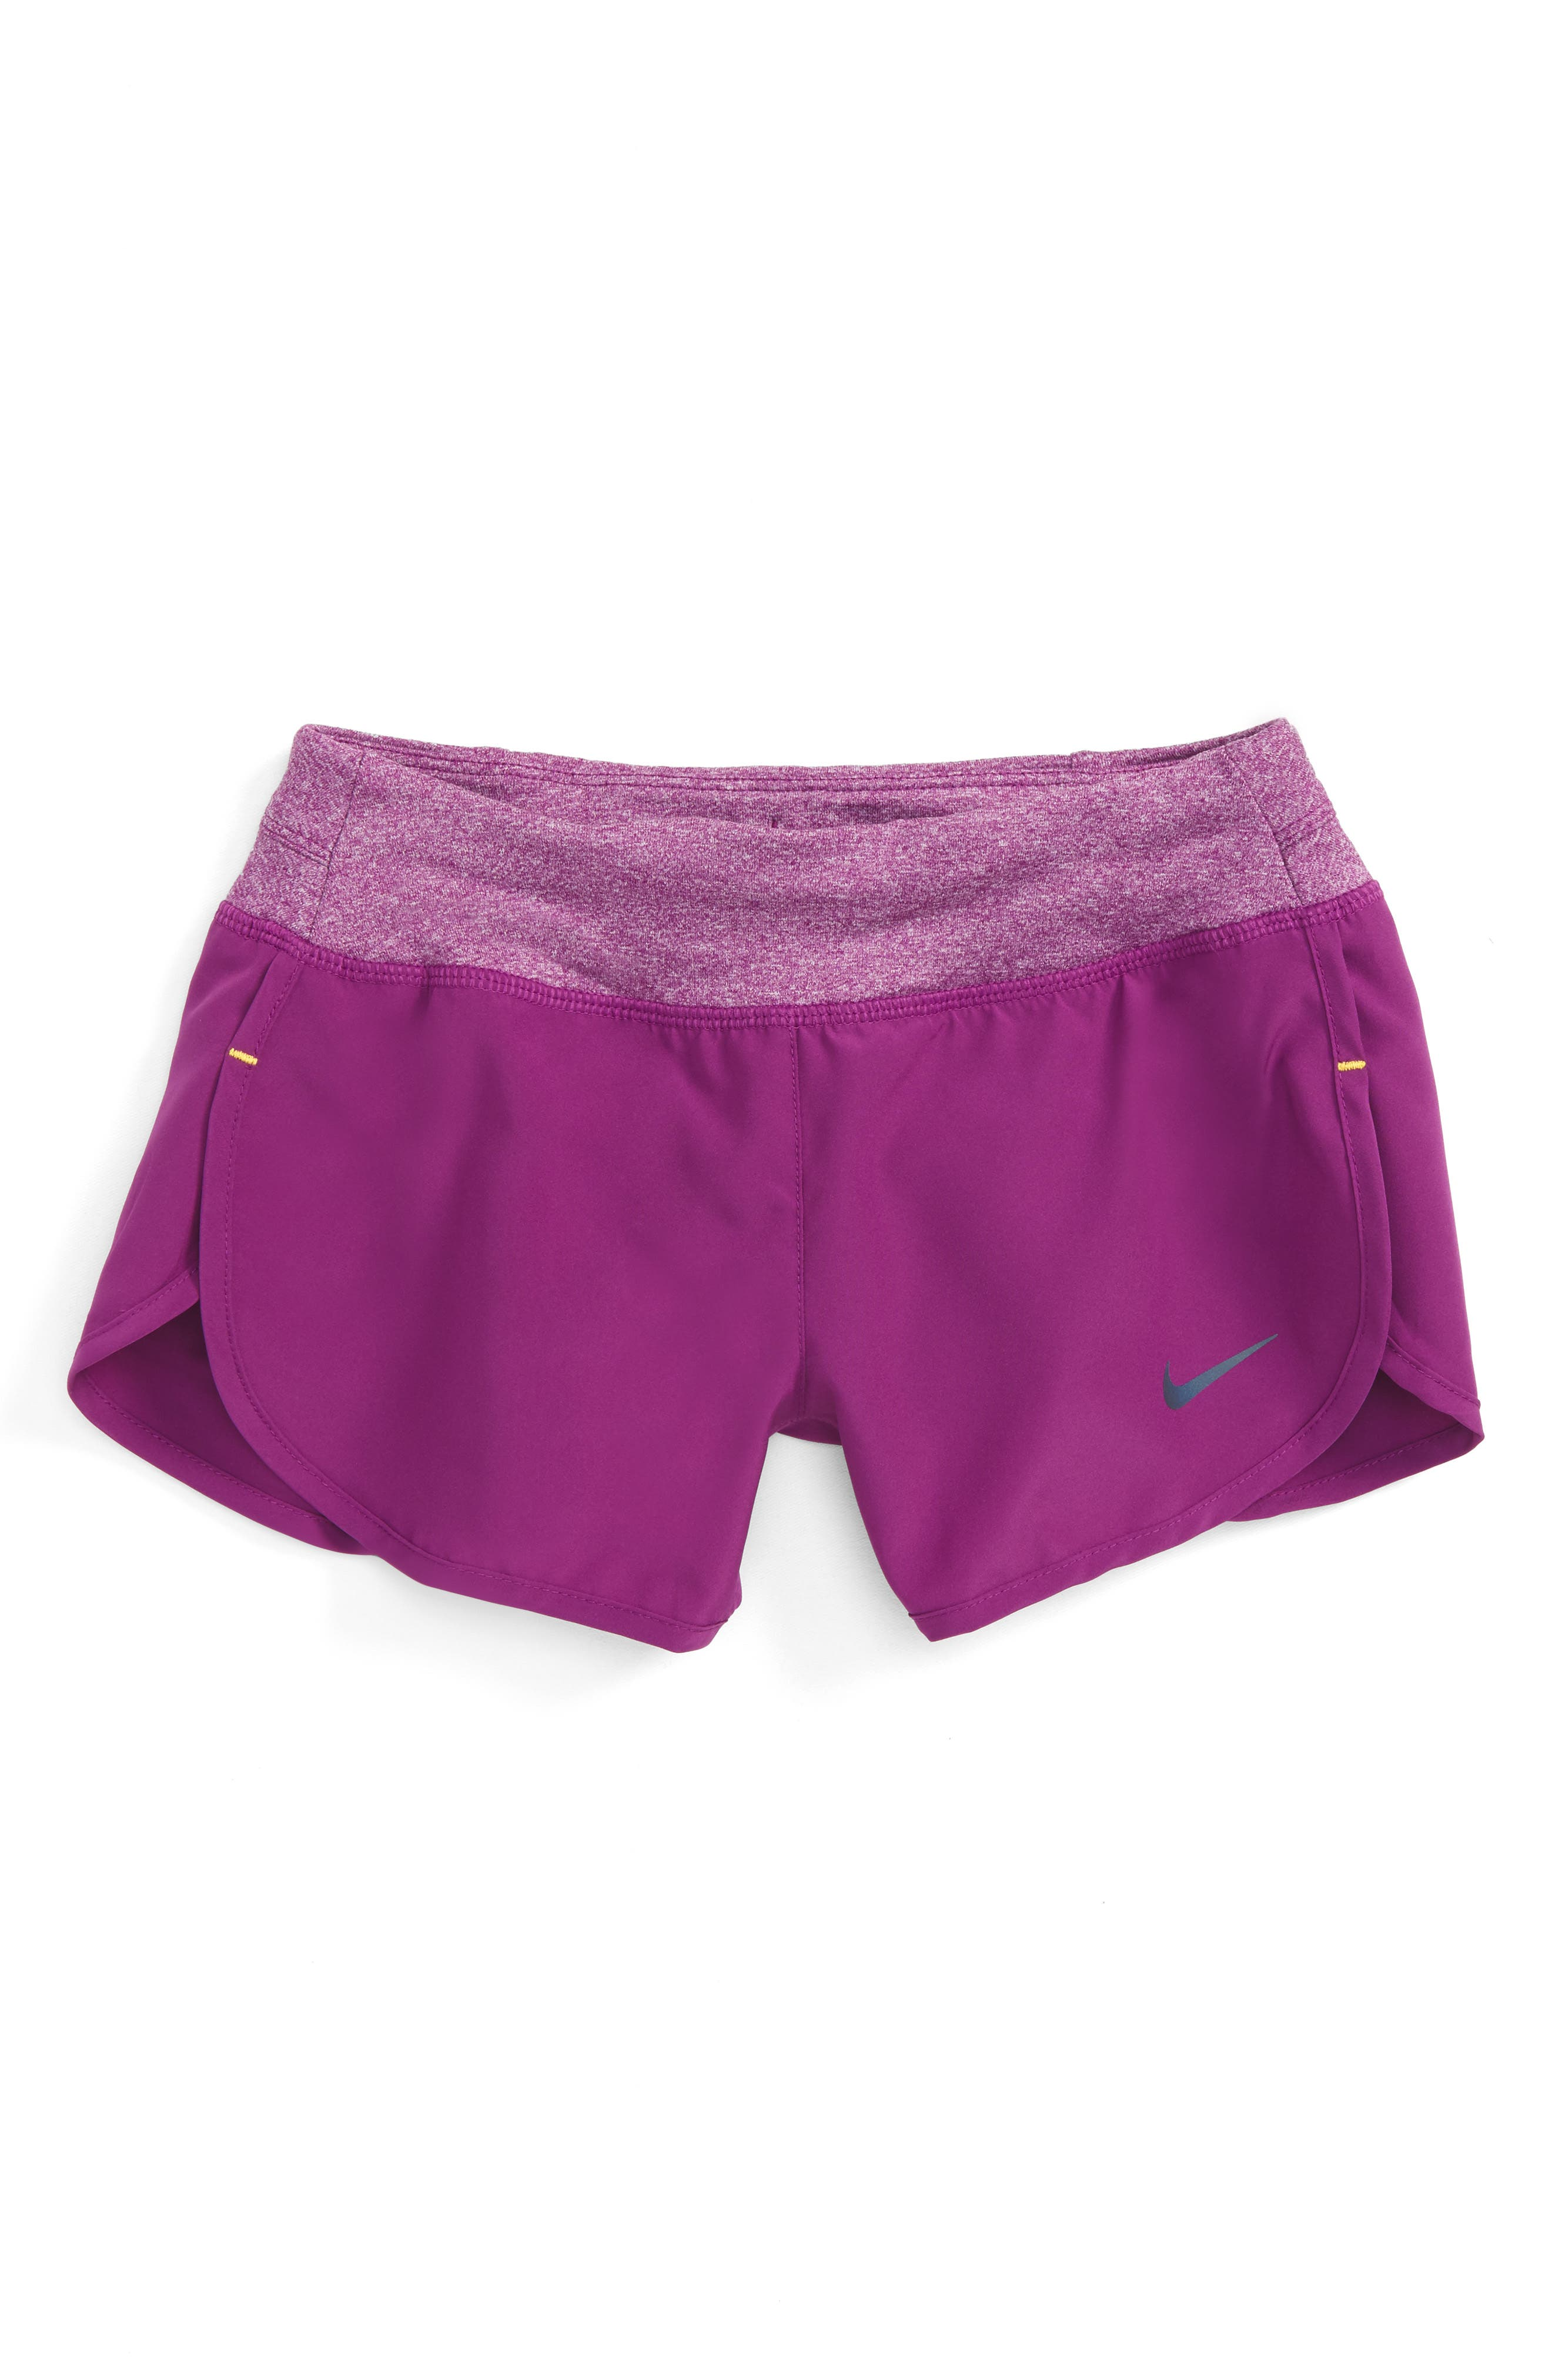 'Rival' Dri-FIT Shorts,                         Main,                         color, 550